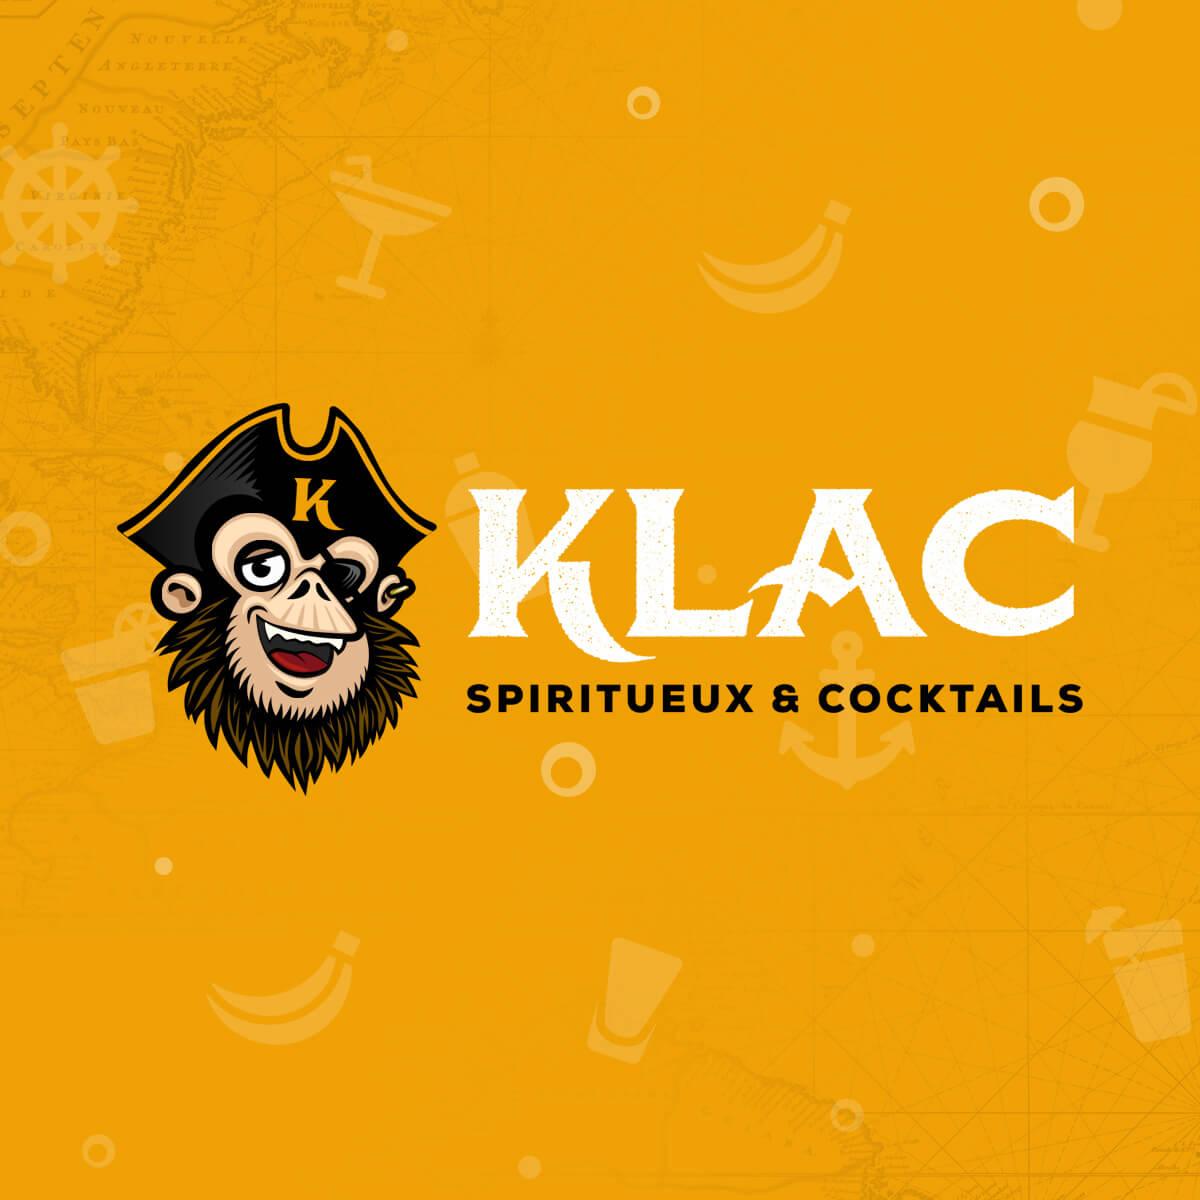 (c) Klac.fr